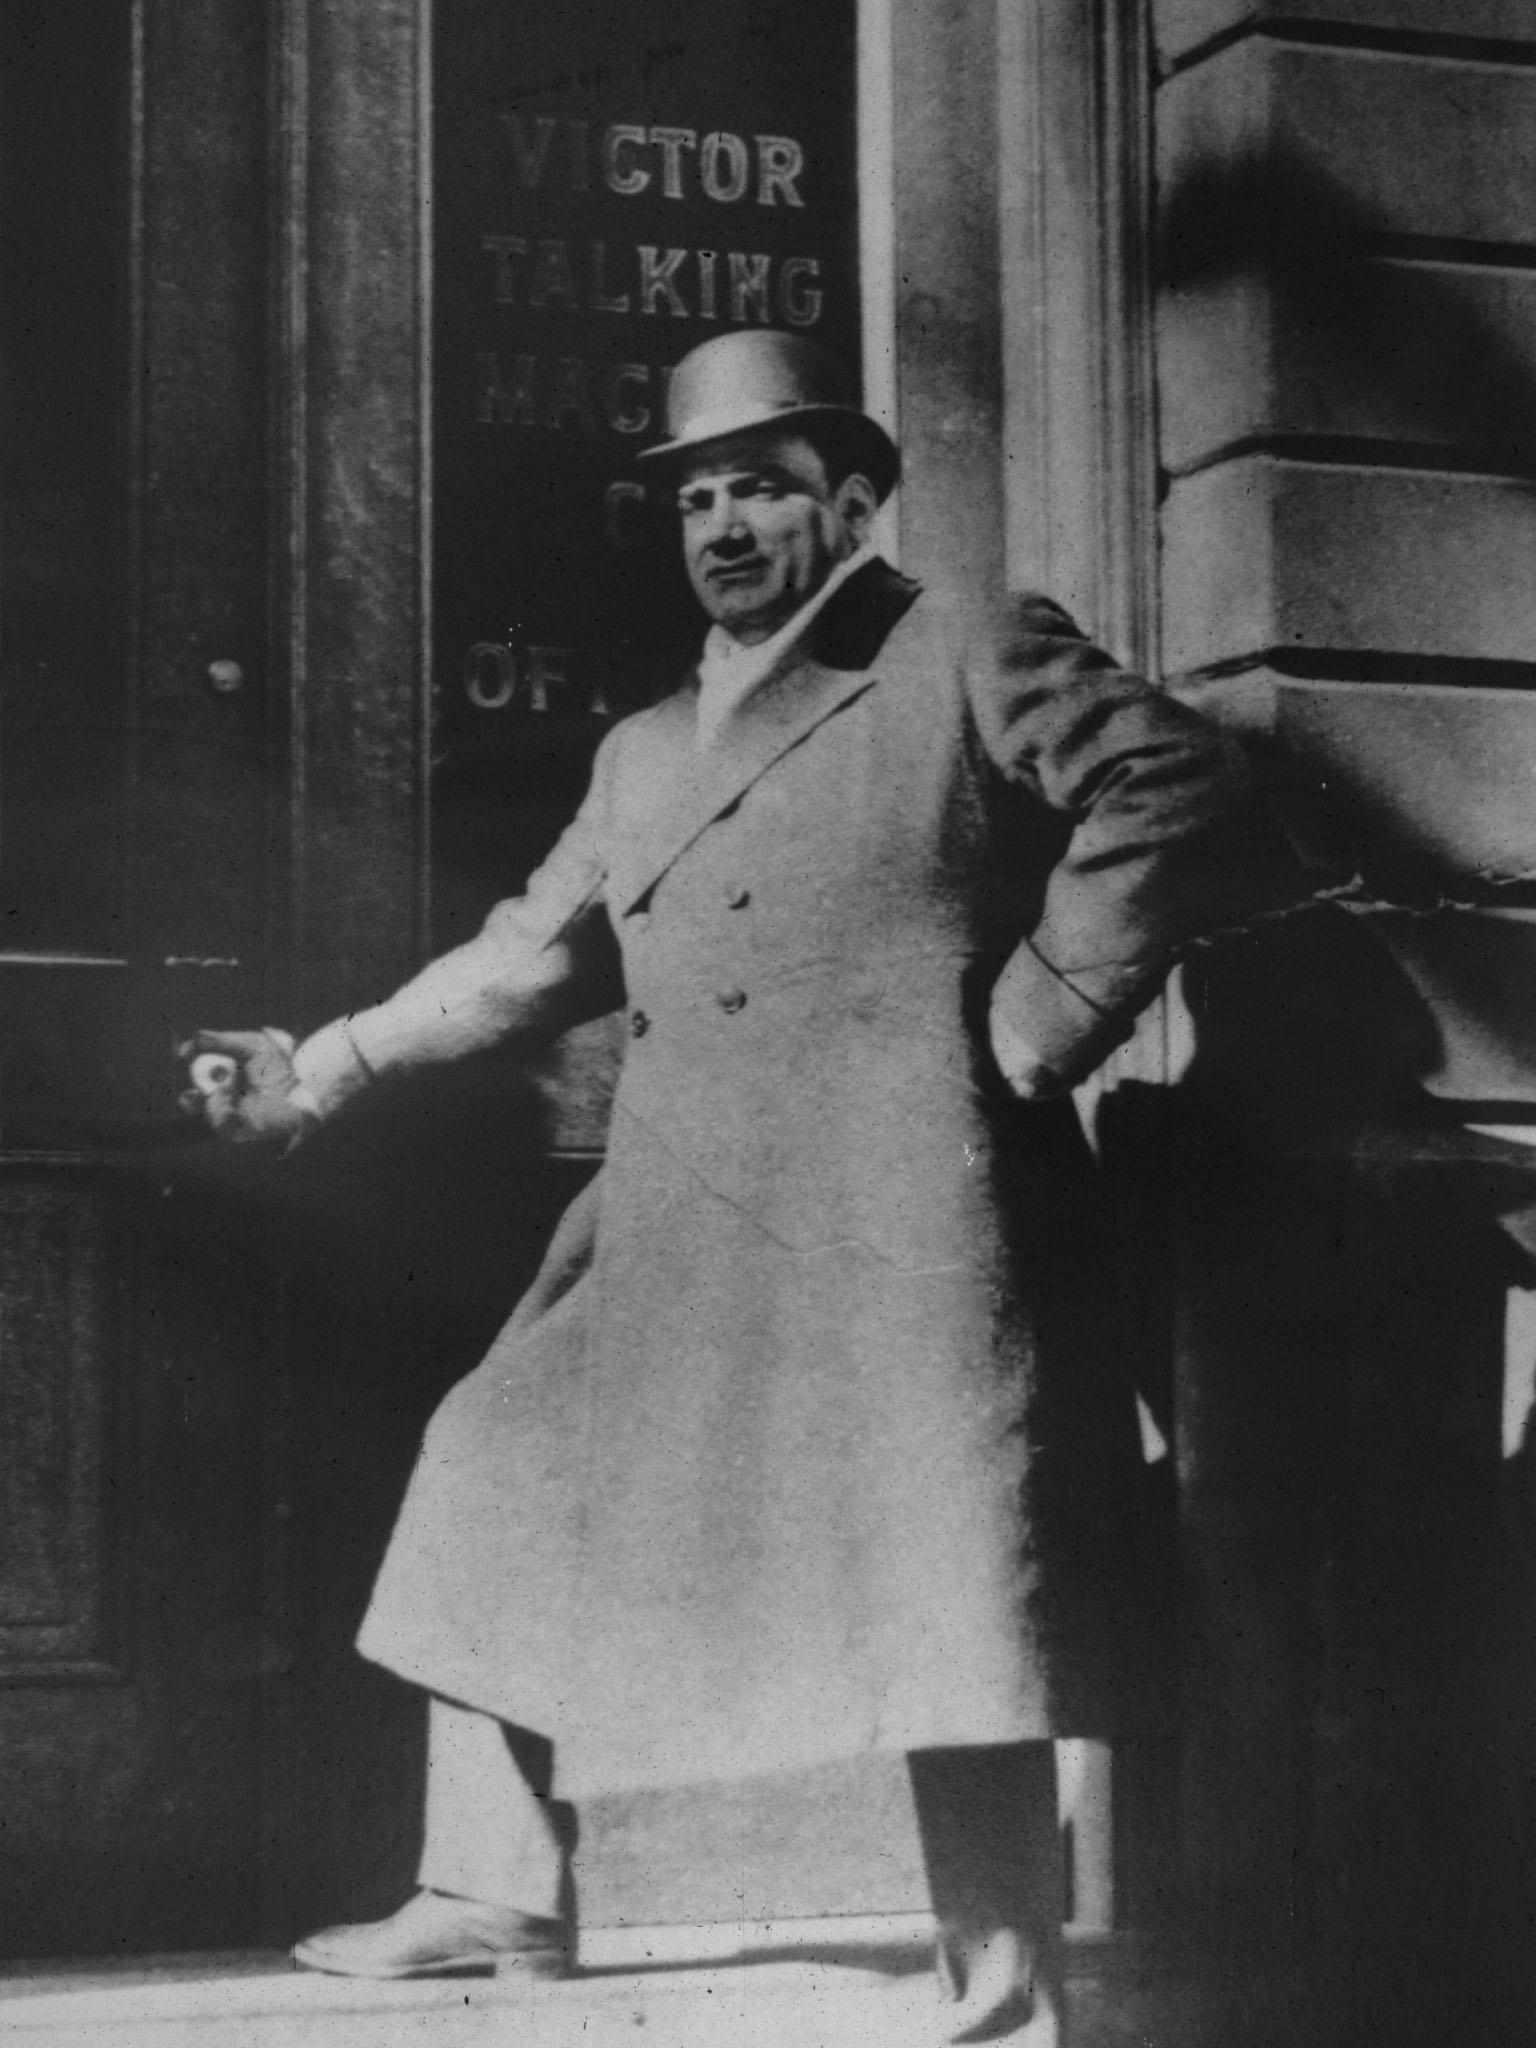 Enrico Caruso (1902-1921)